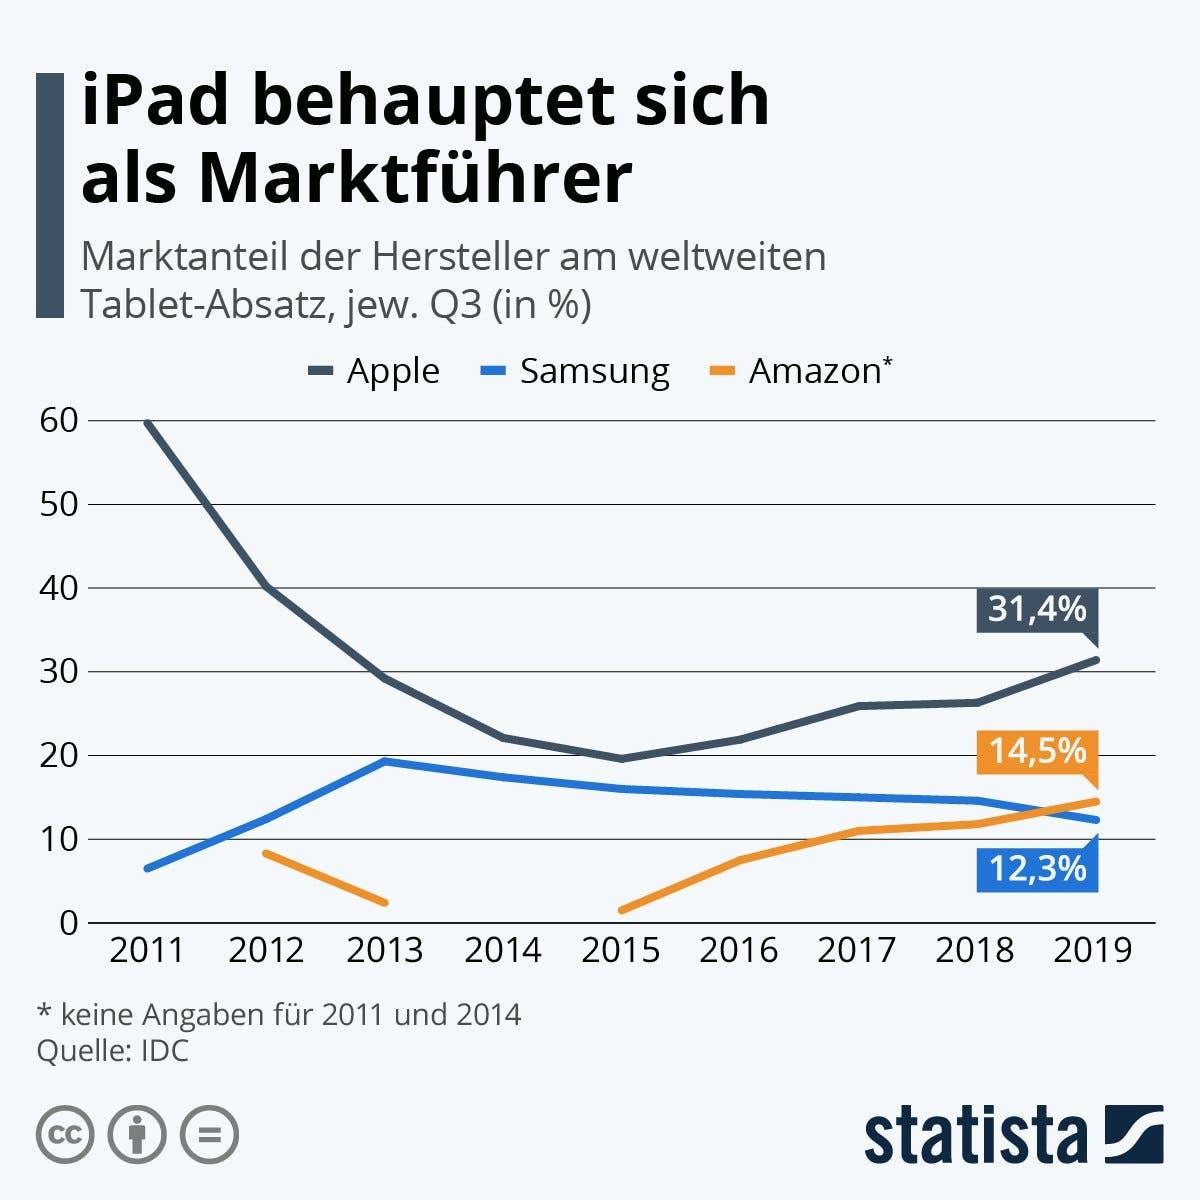 Apple iPad 10 Jahre Marktanalyse